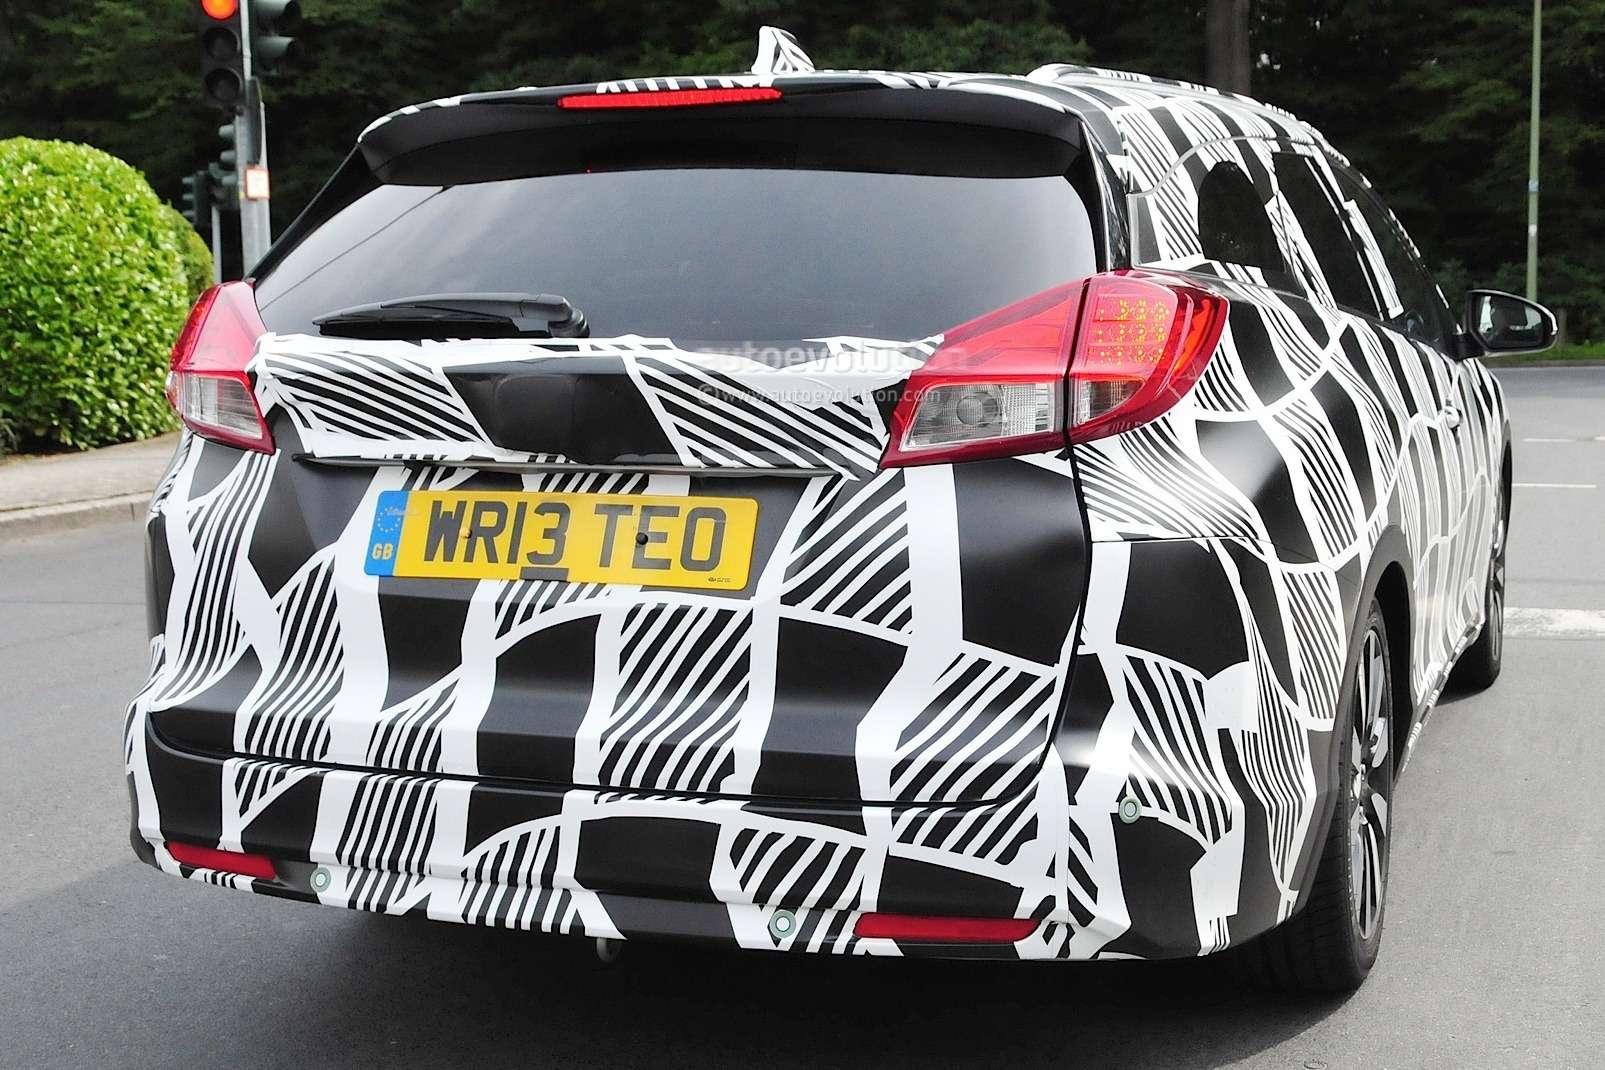 2015-honda-civic-tourer-facelift-spied-testing_4